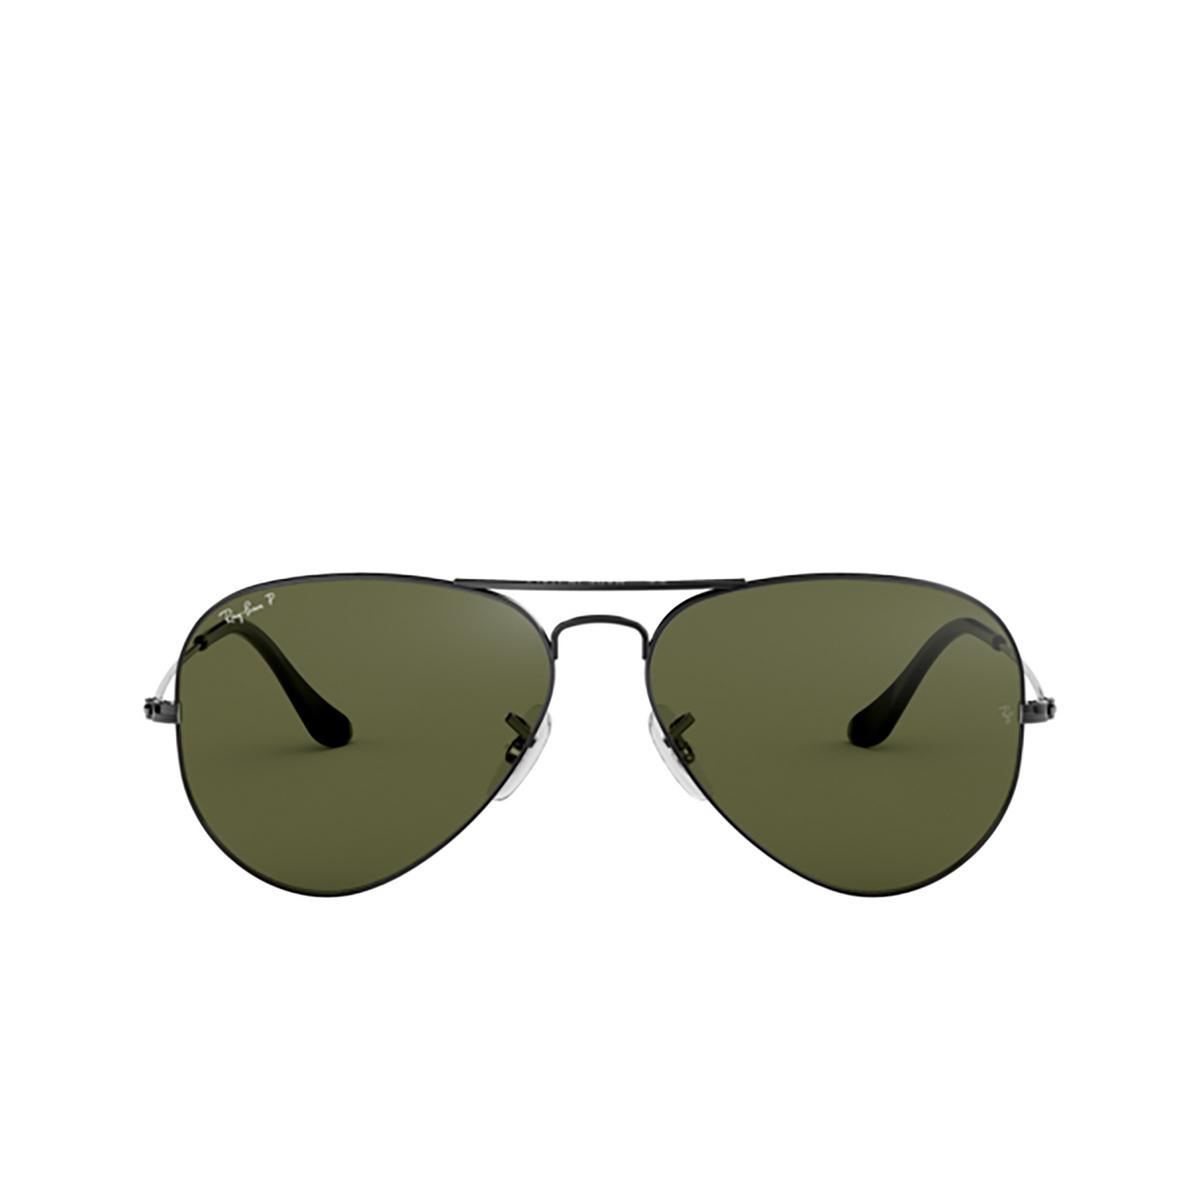 Ray-Ban® Aviator Sunglasses: Aviator Large Metal RB3025 color Gunmetal 004/58 - front view.